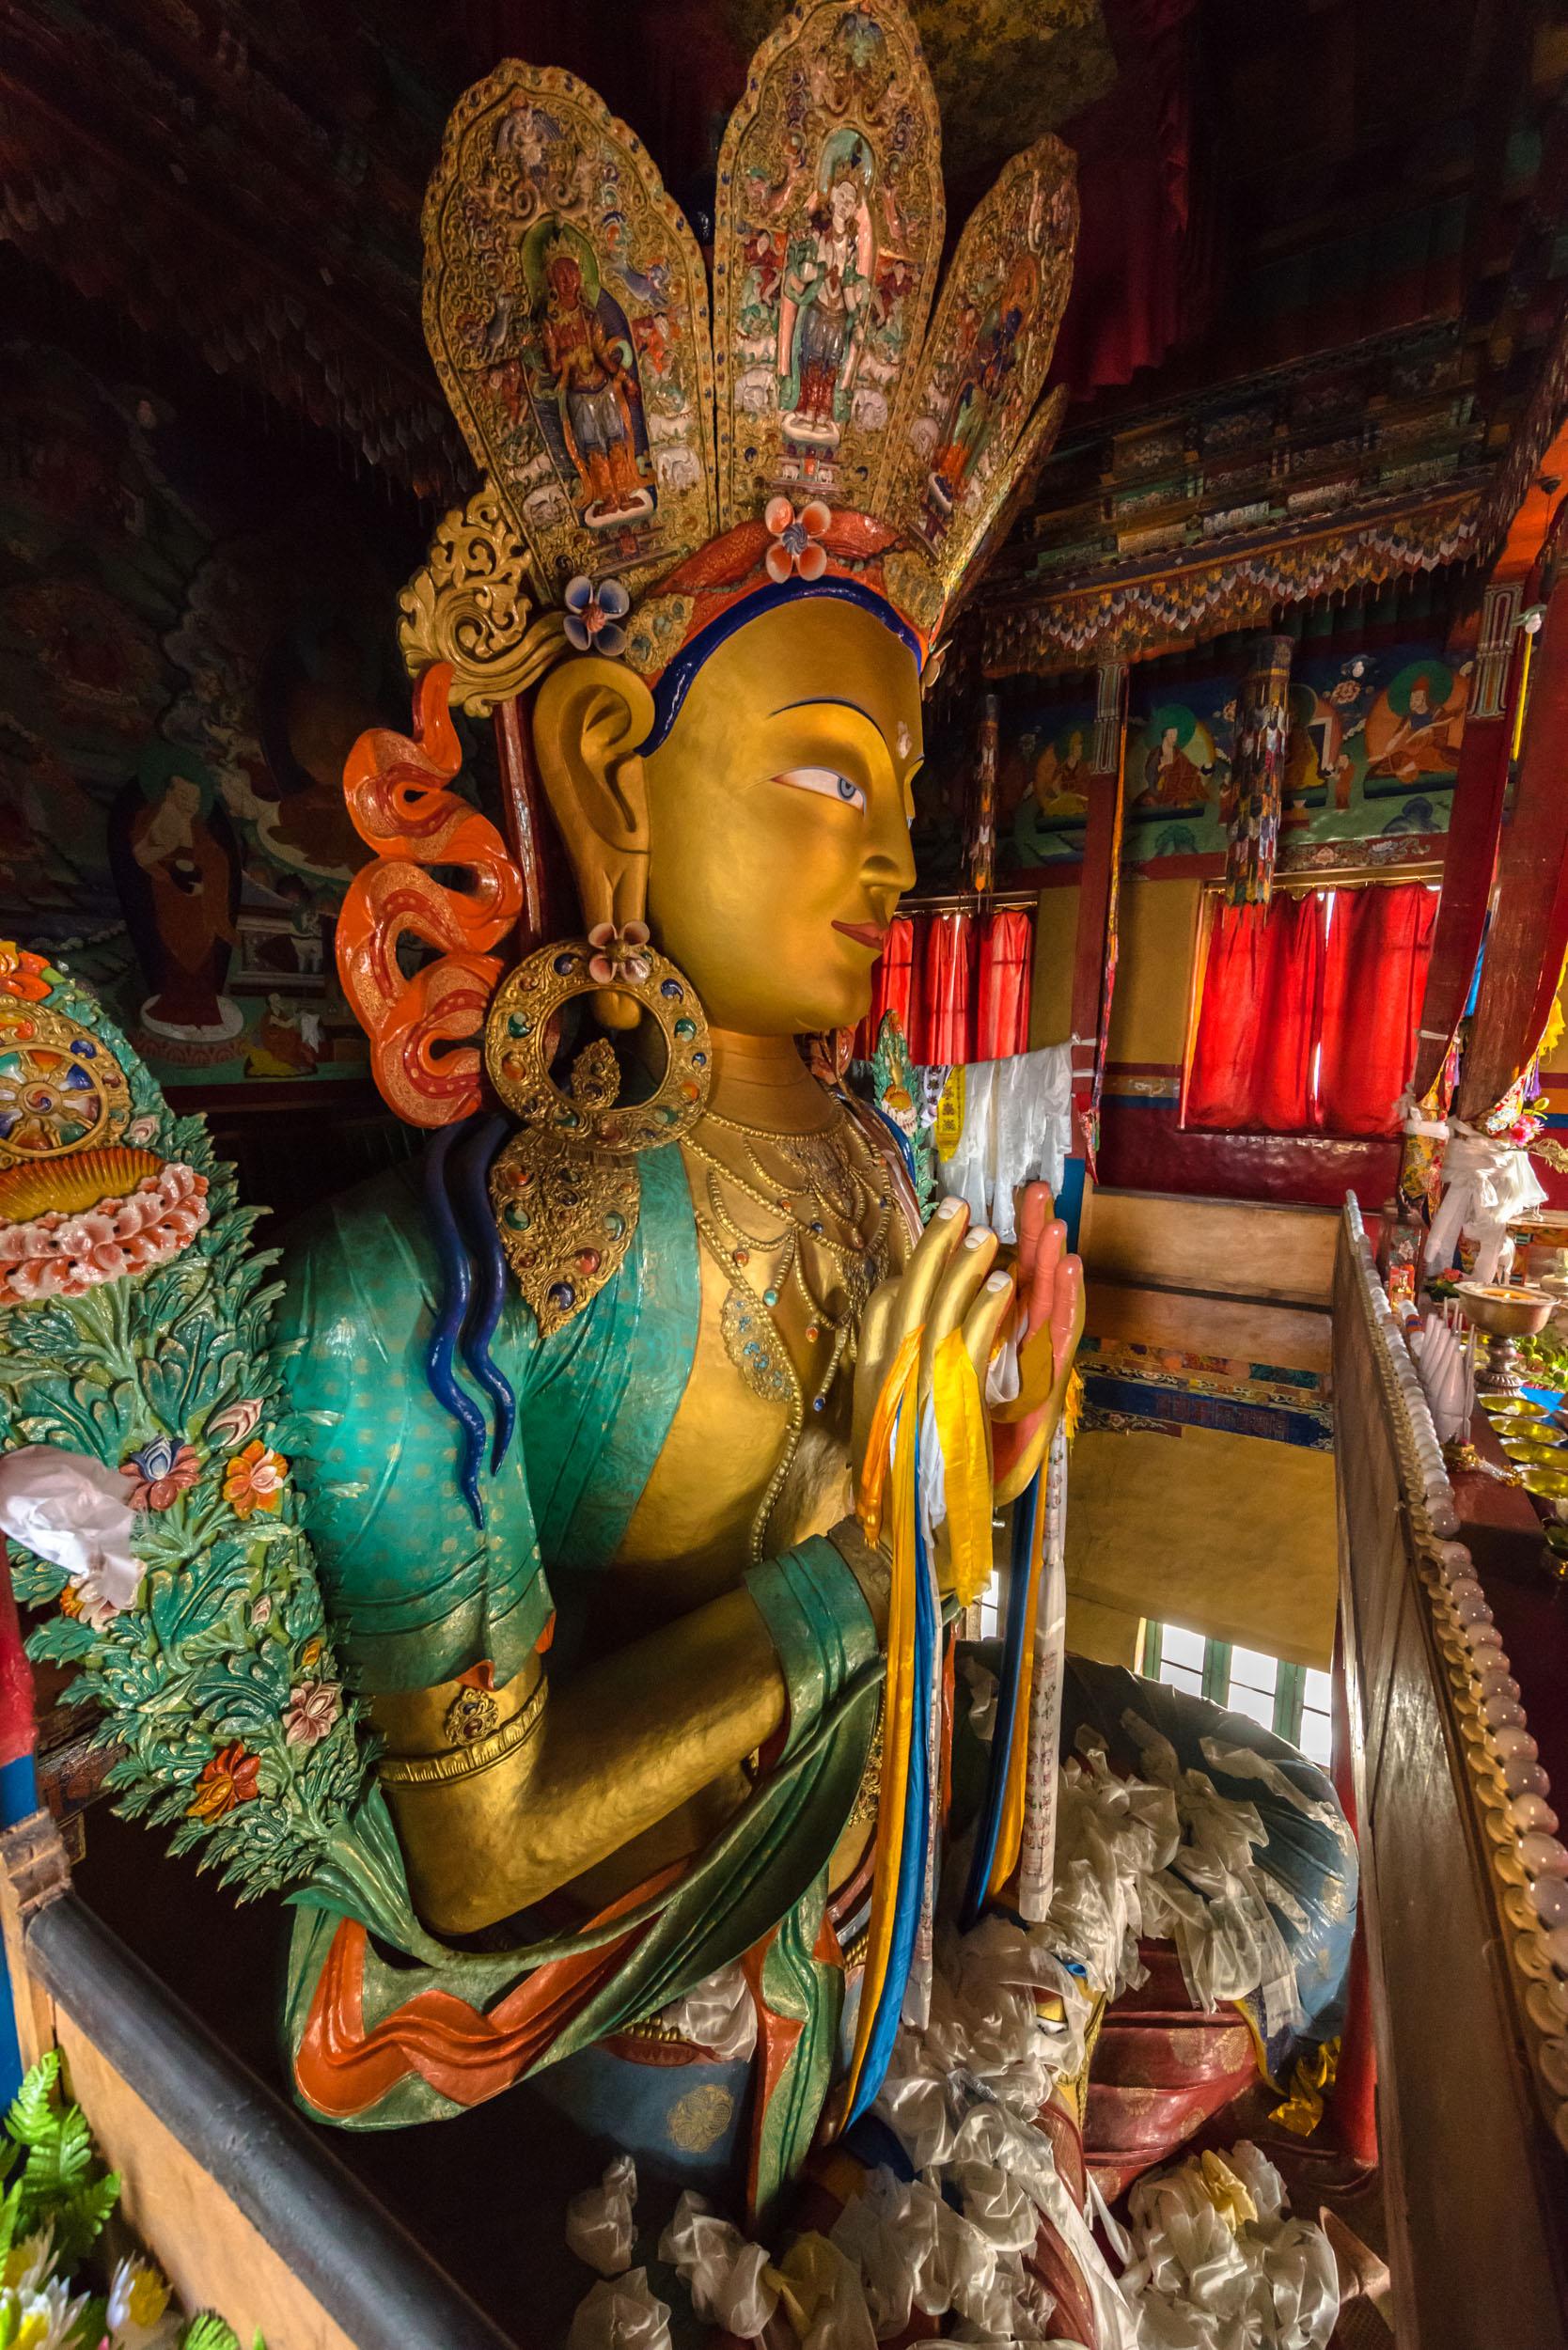 Statue of Maitreya,Leh, Jammu and Kashmir